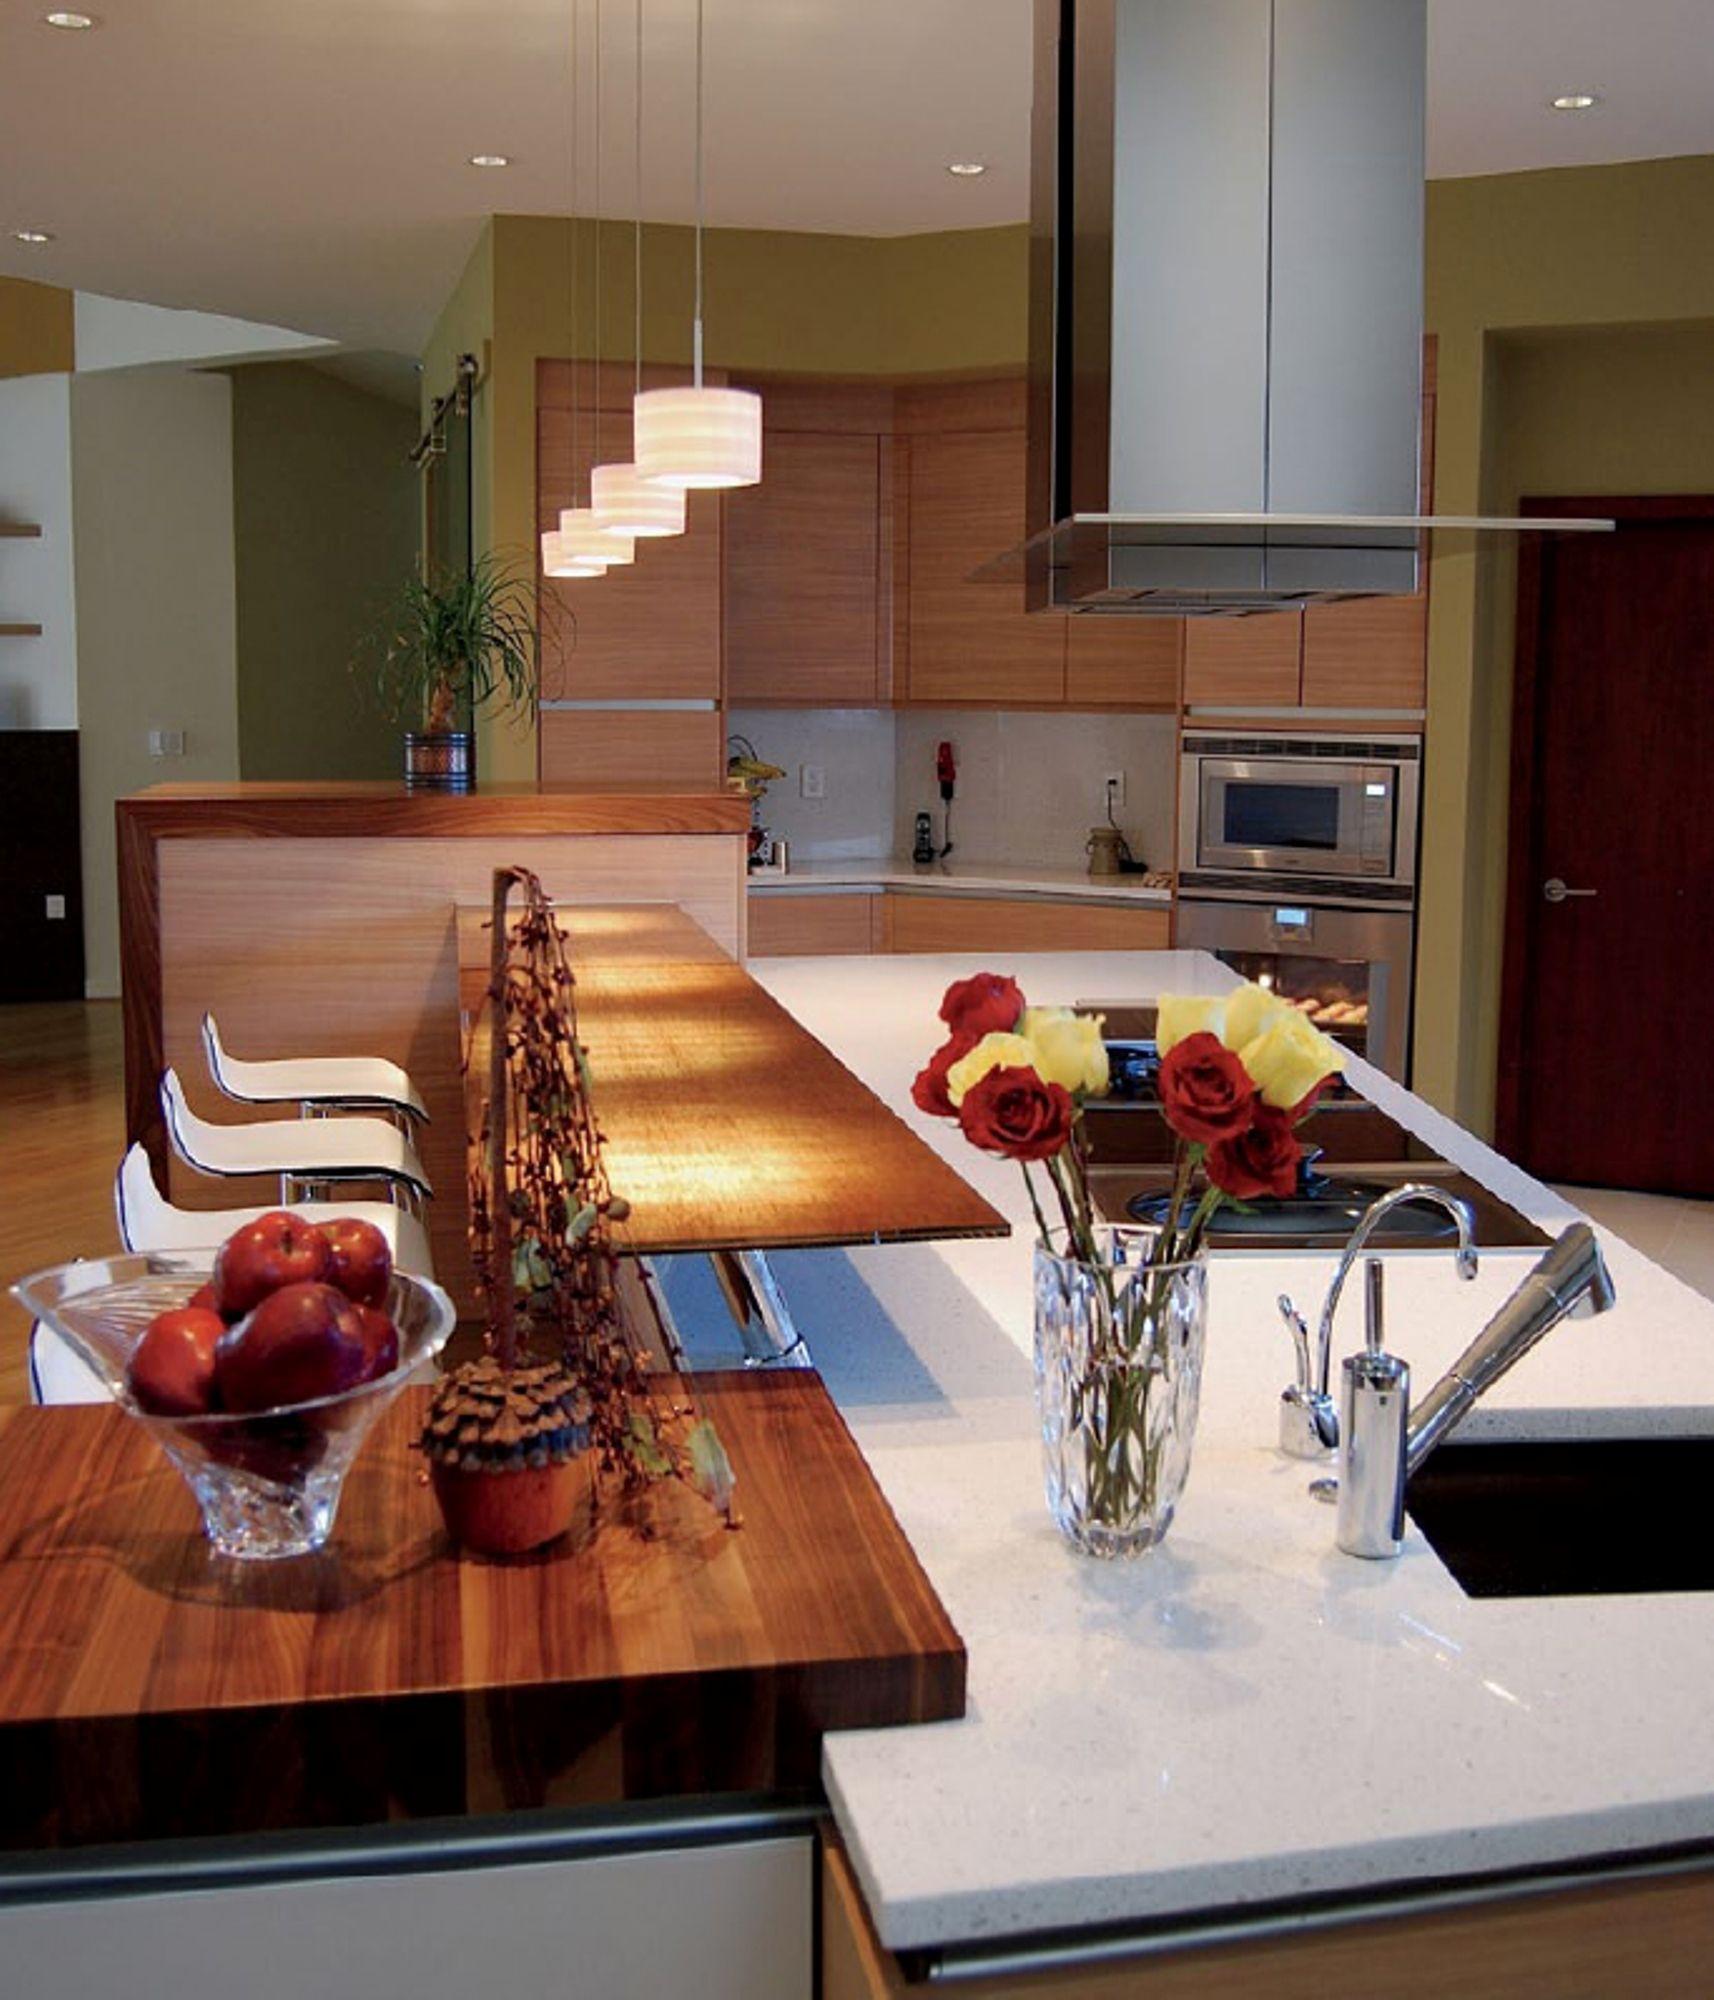 Walnut Kitchen Designs: Pin By Grothouse On Walnut Wood Countertops